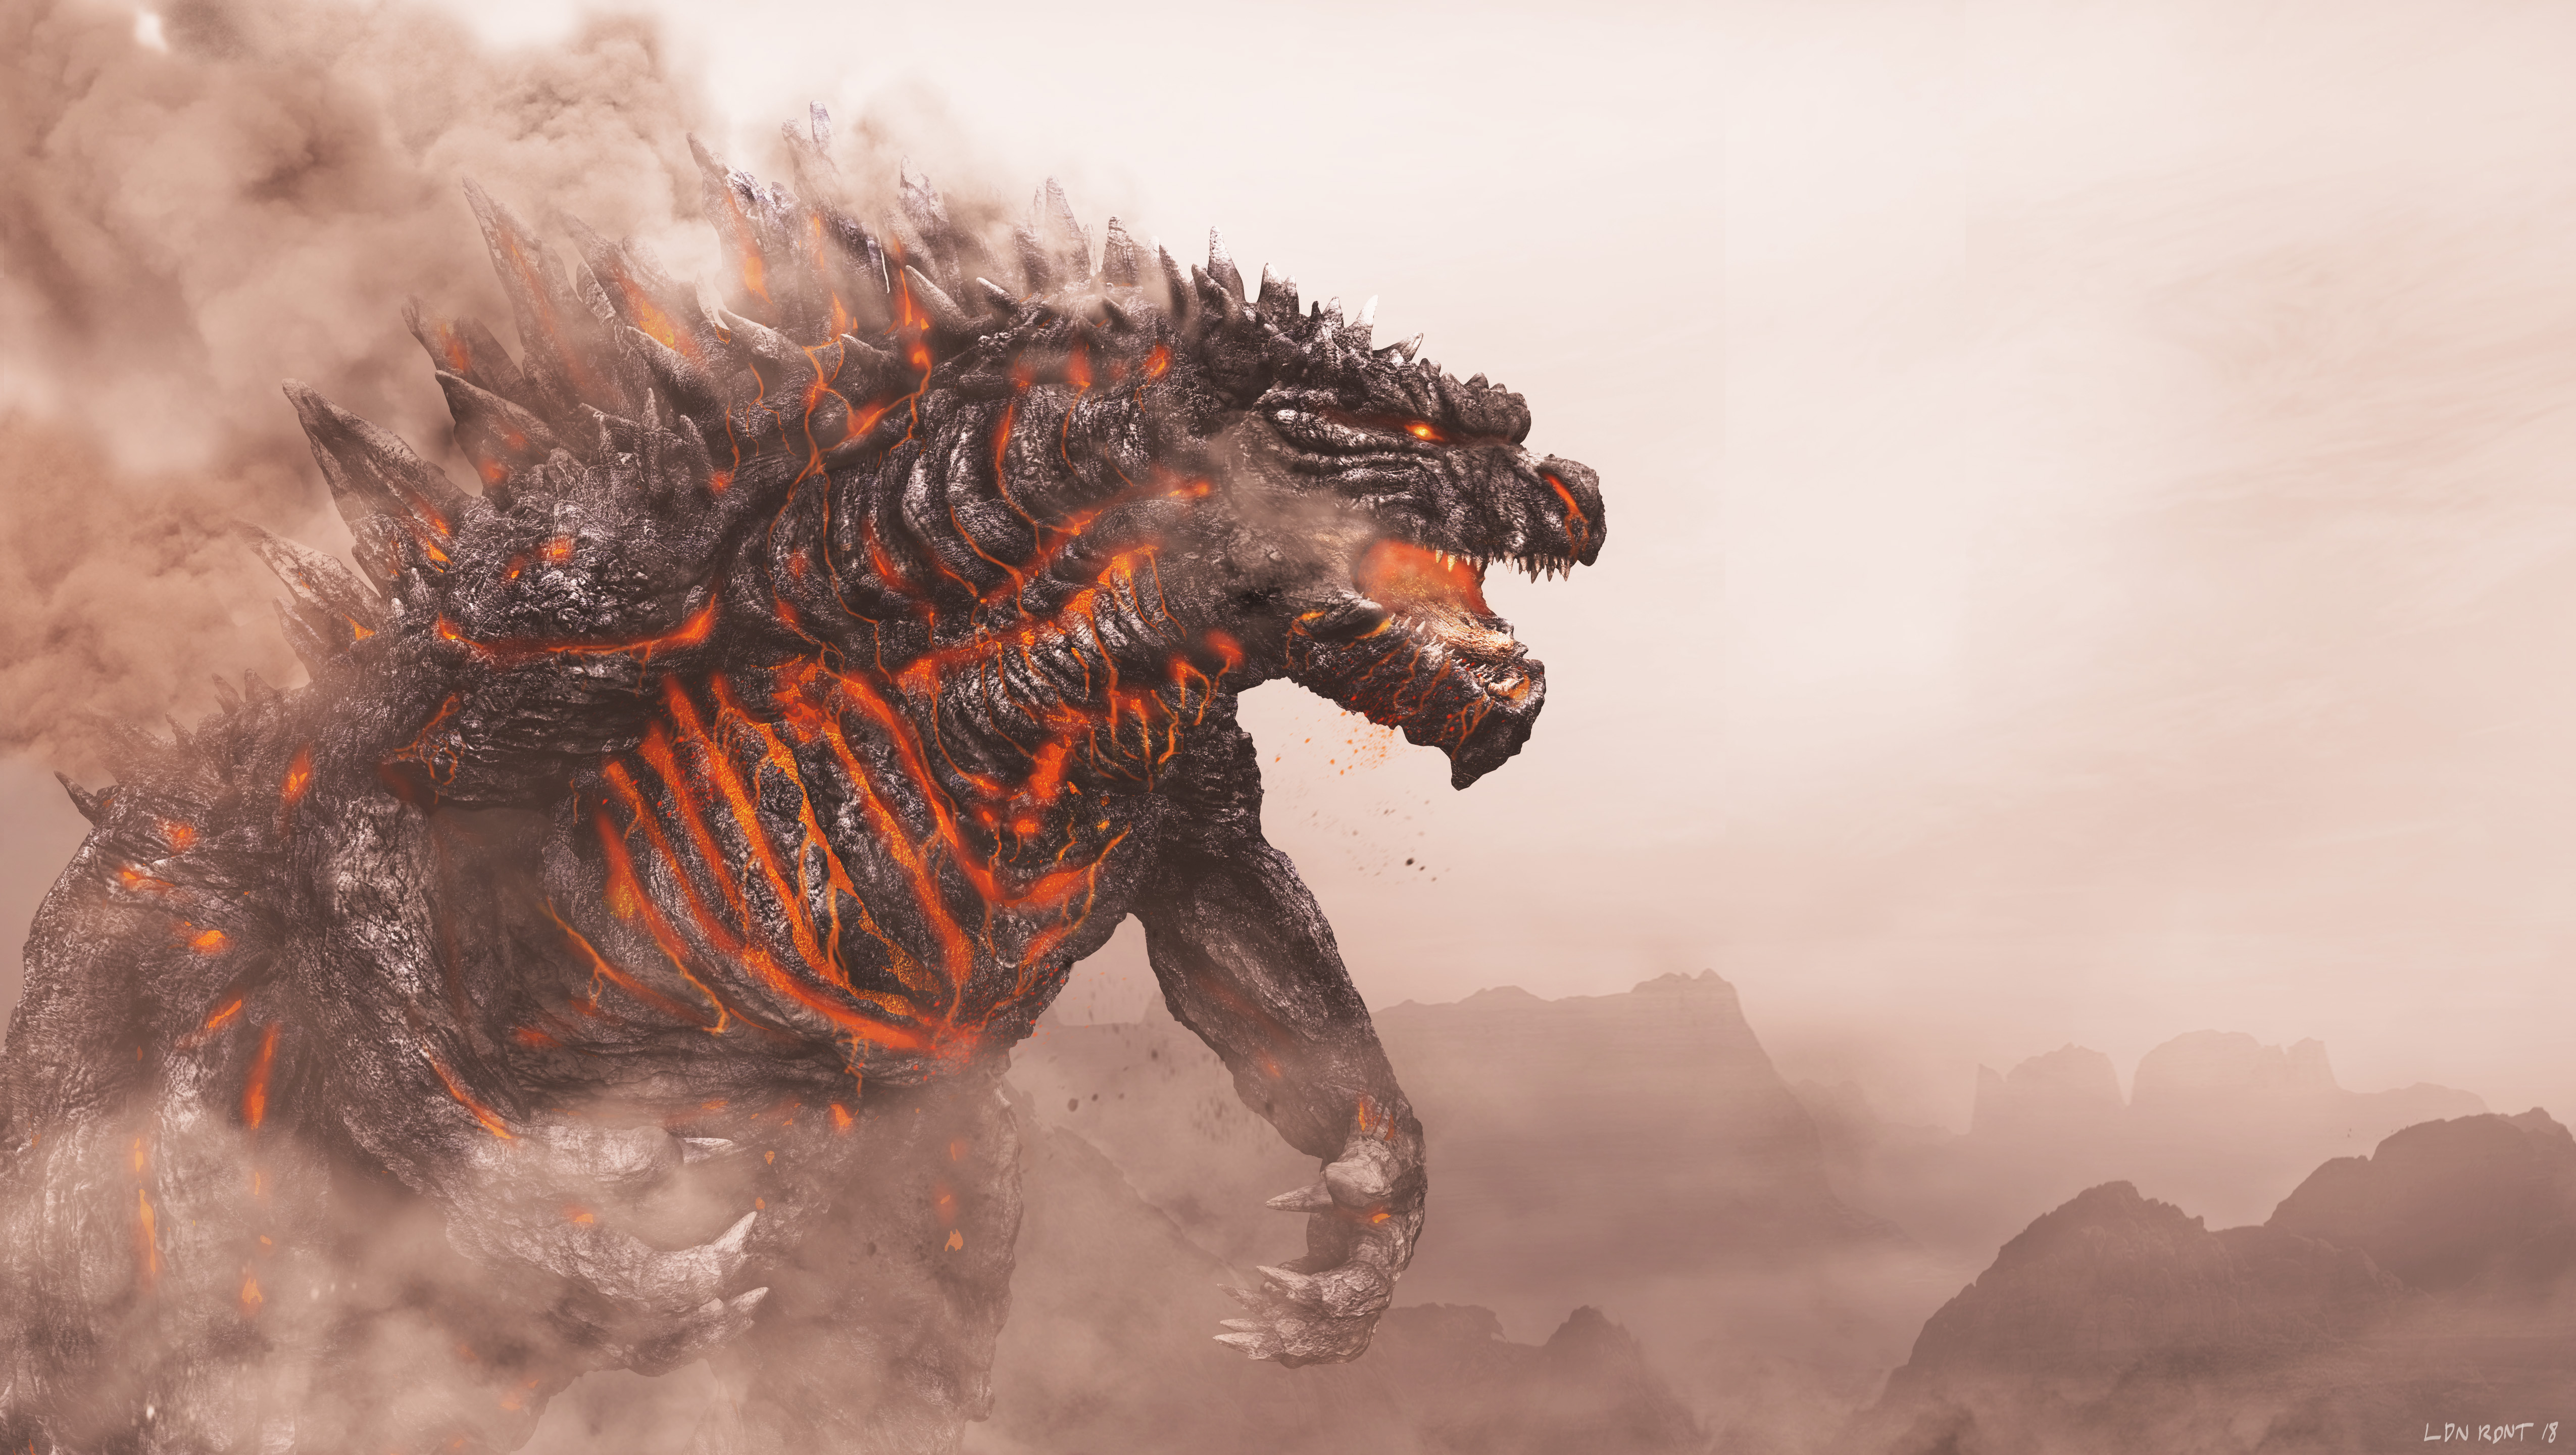 Godzilla 5100x2880